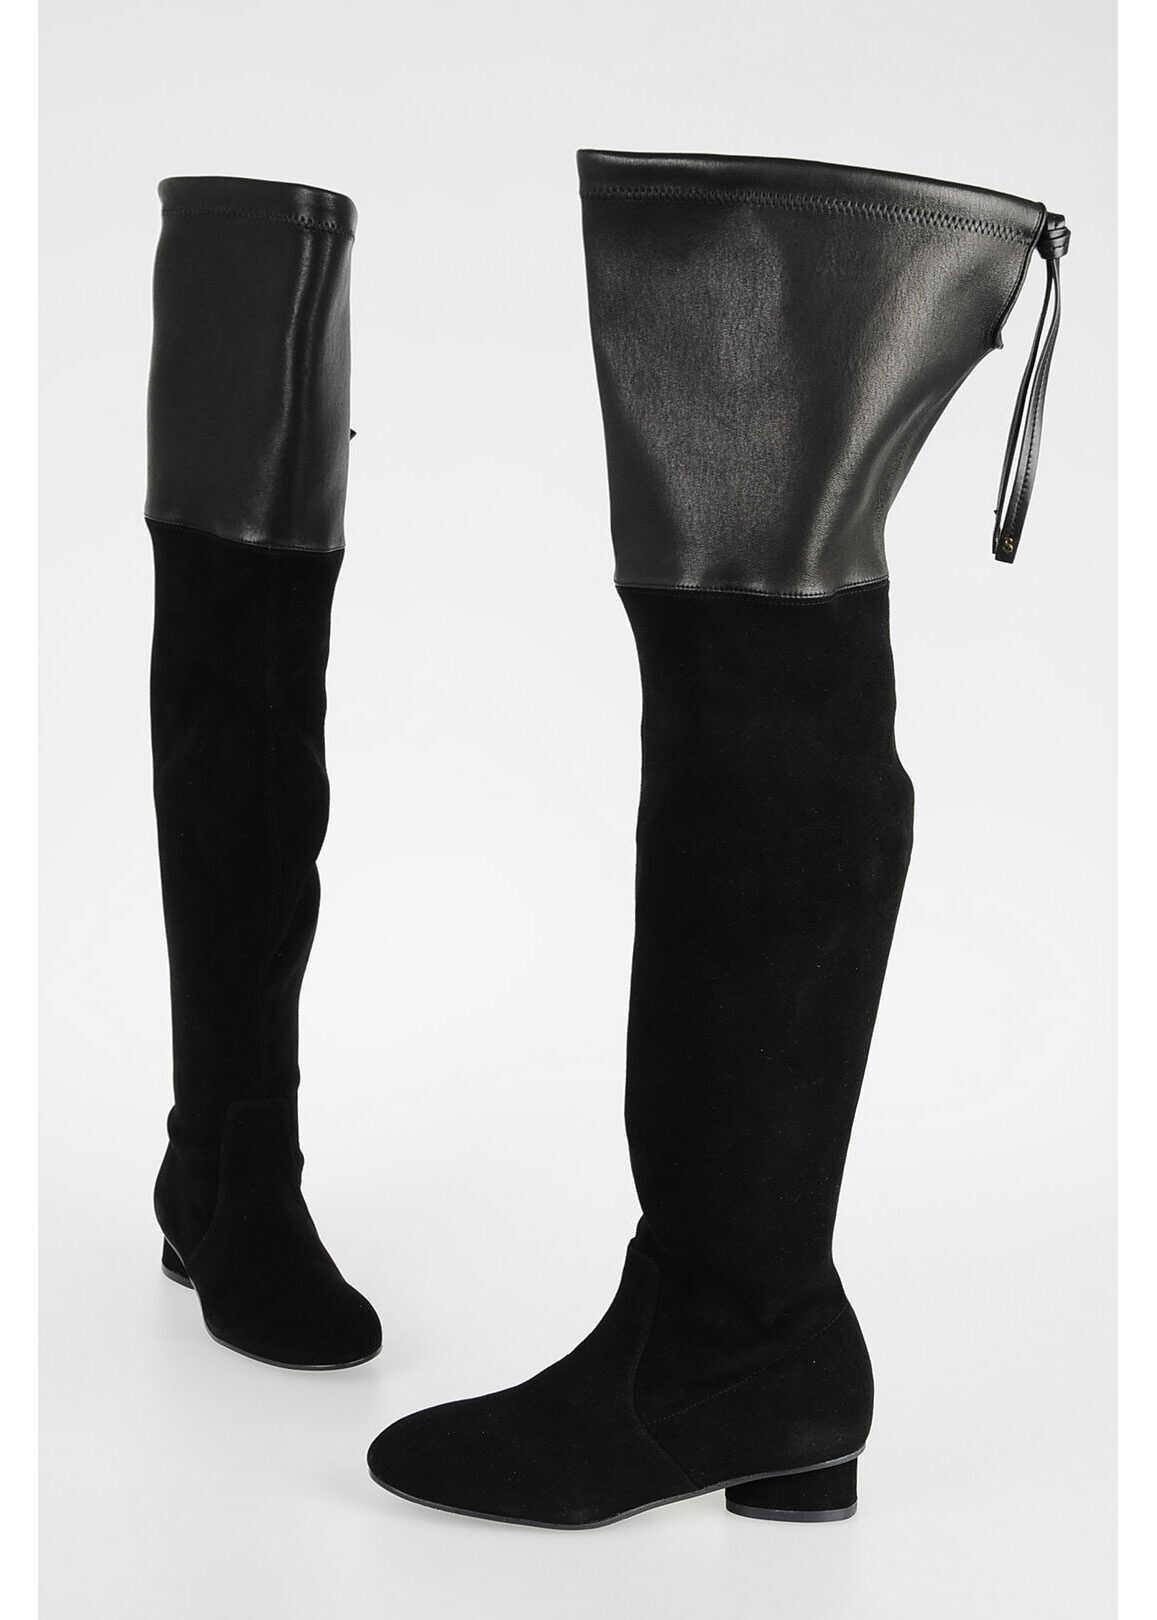 Stuart Weitzman Suede Leather HELENA Boots BLACK